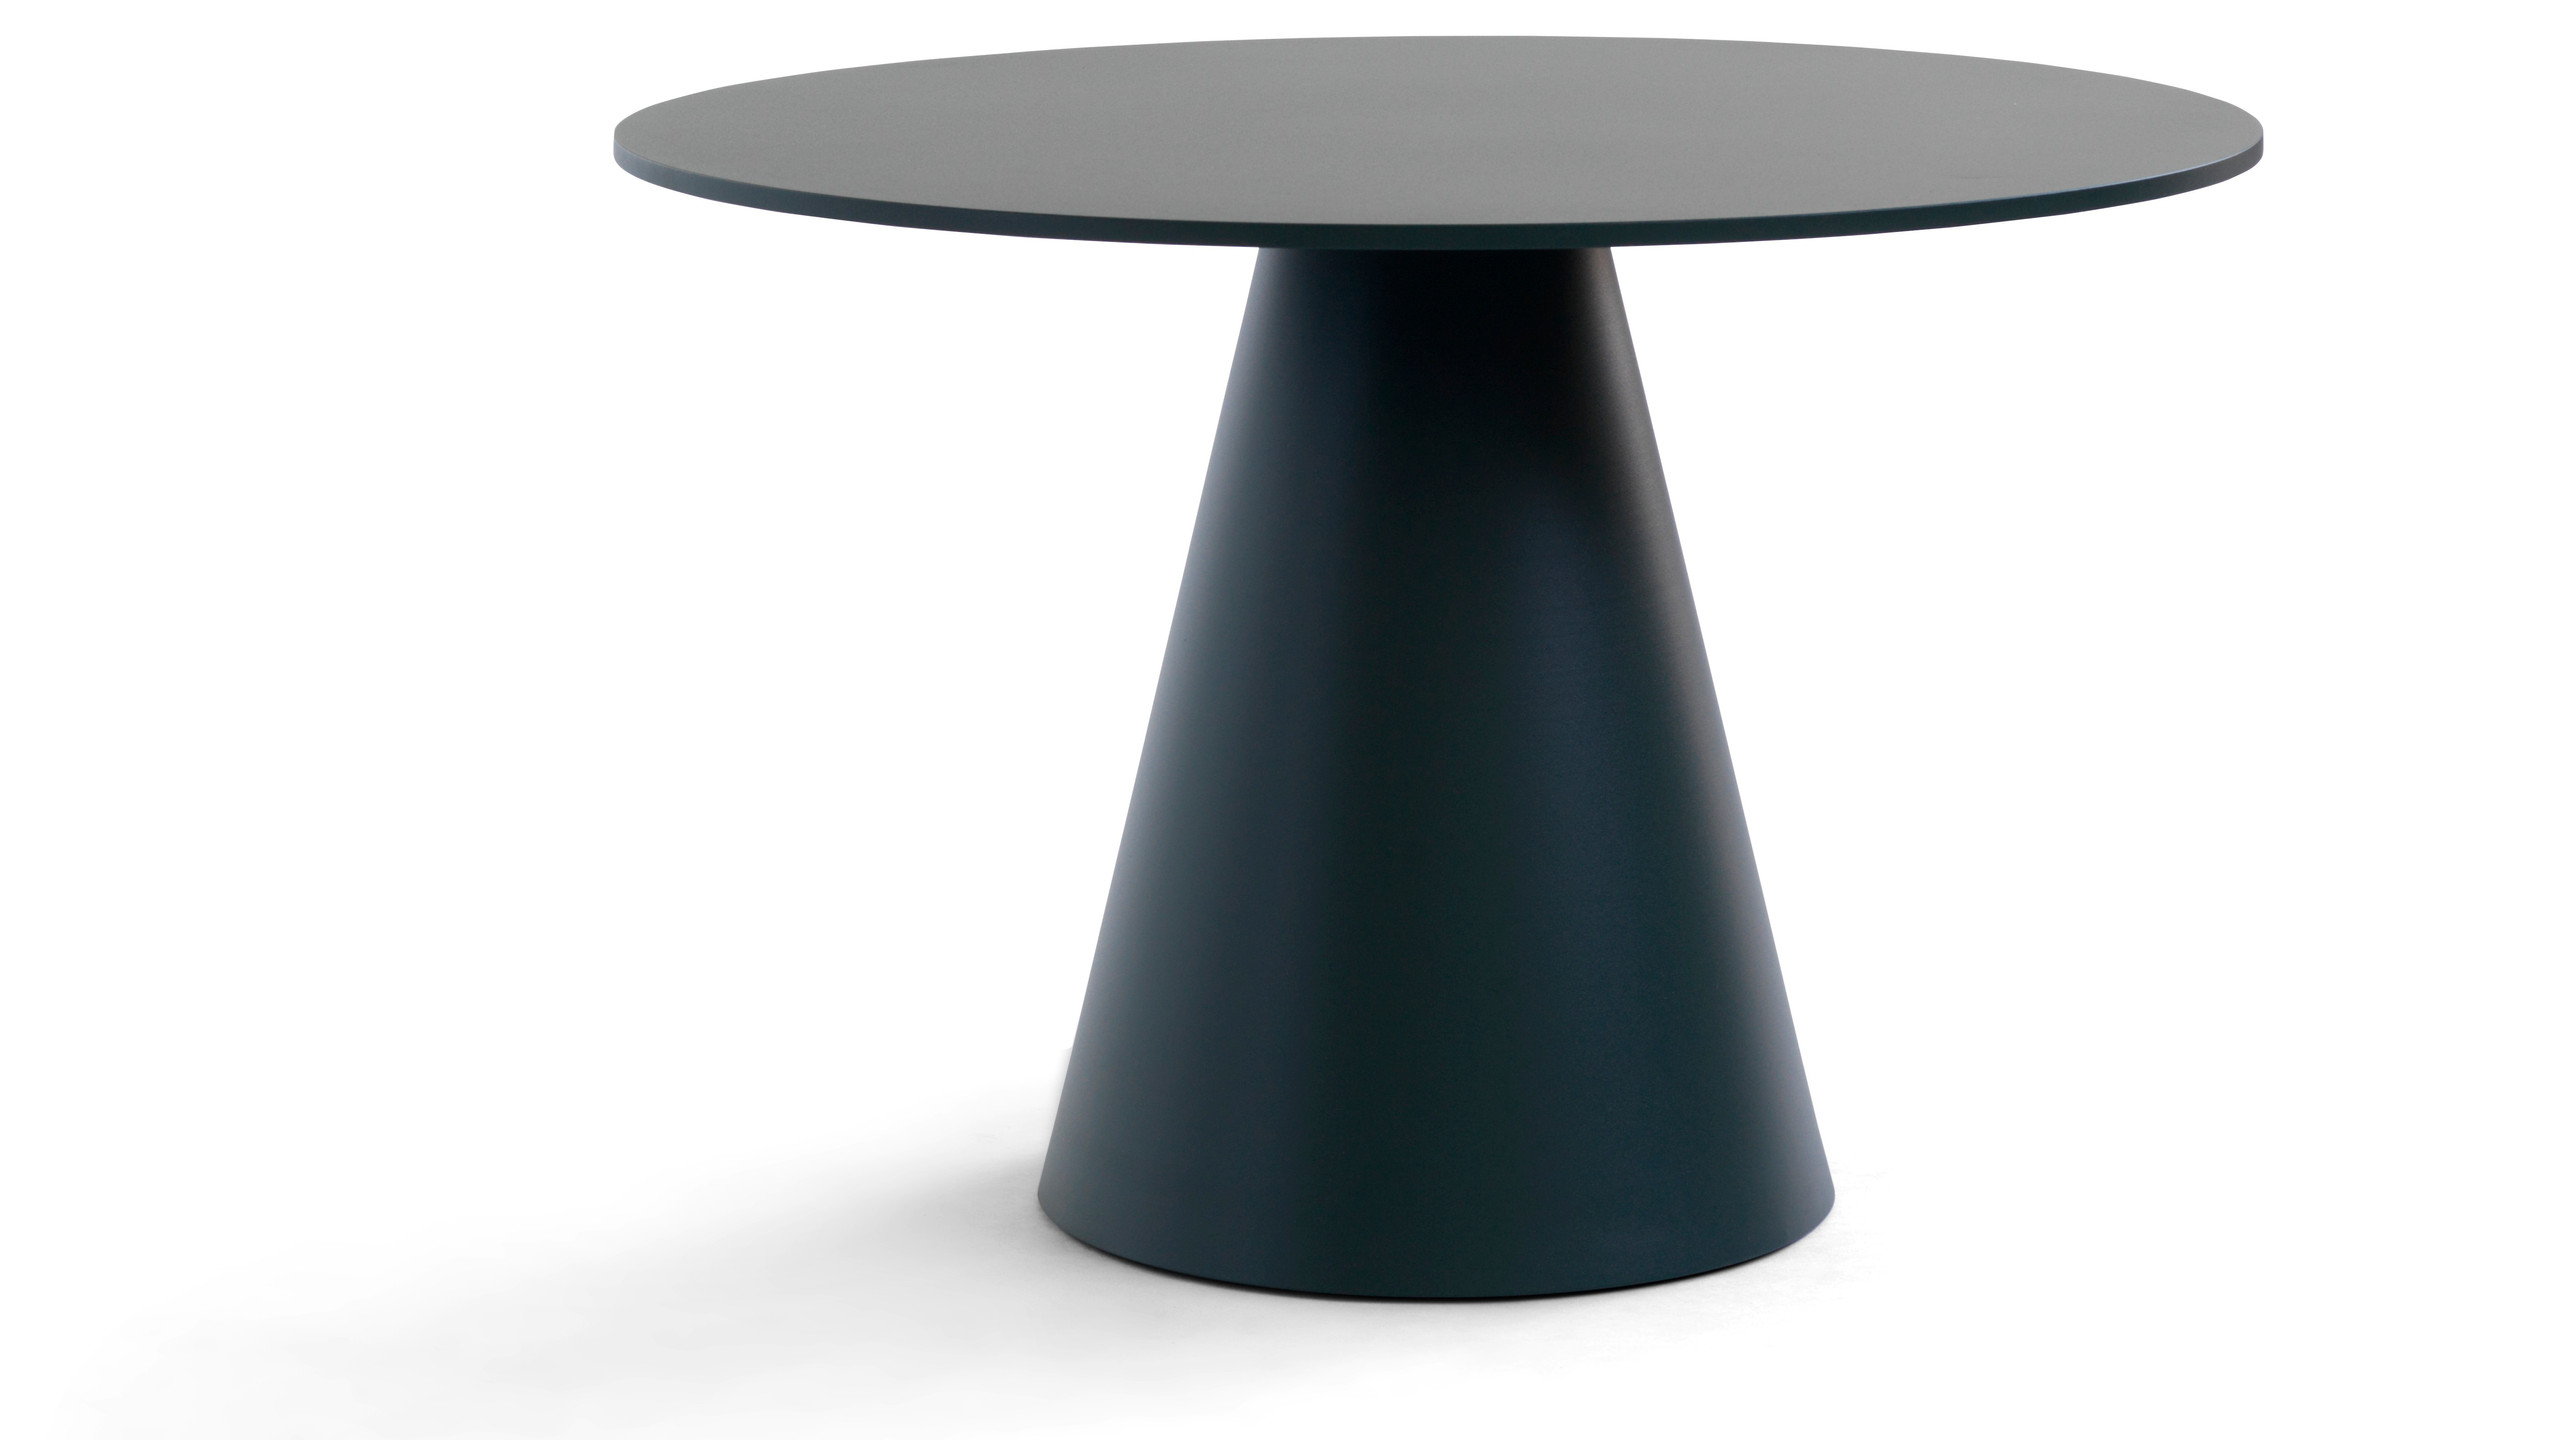 Table basse alu design outdoor exterieur JACKLESS de BLA STATION